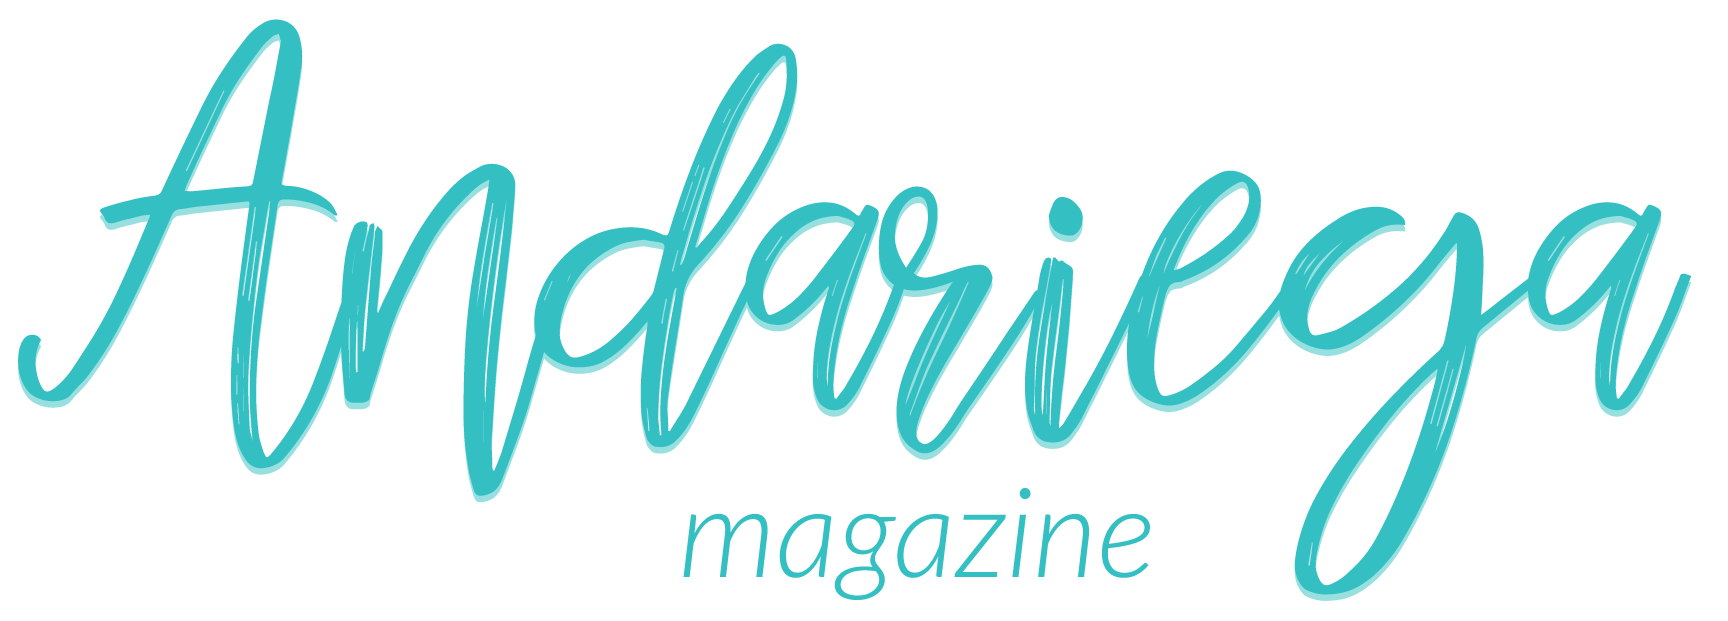 cropped-andariega-magazine-1.png